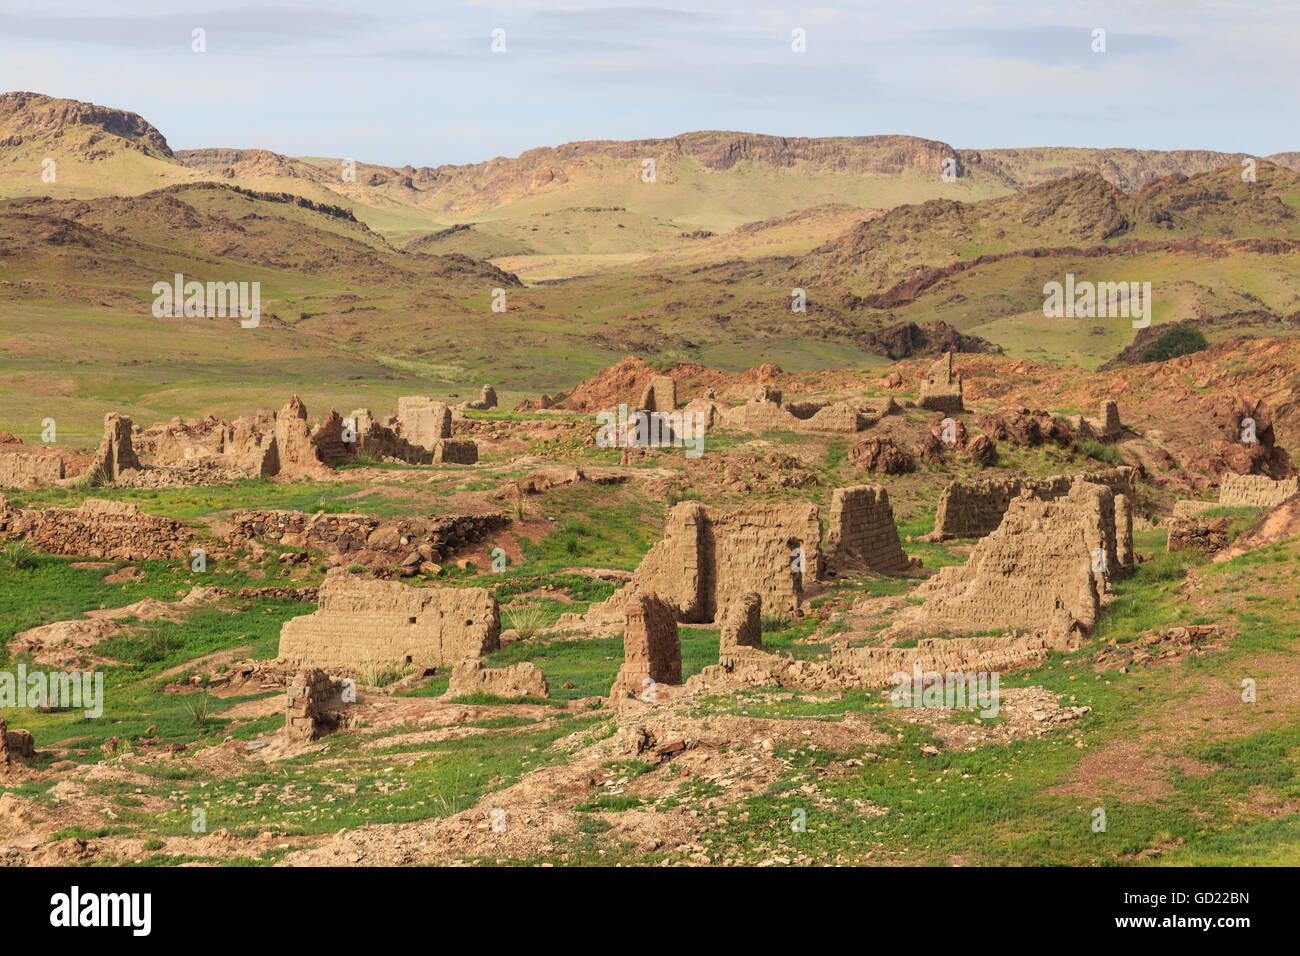 Ongiin Khiid monastery ruins, Saikhan Ovoo, The Gobi, Mongolia, Central Asia, Asia - Stock Image